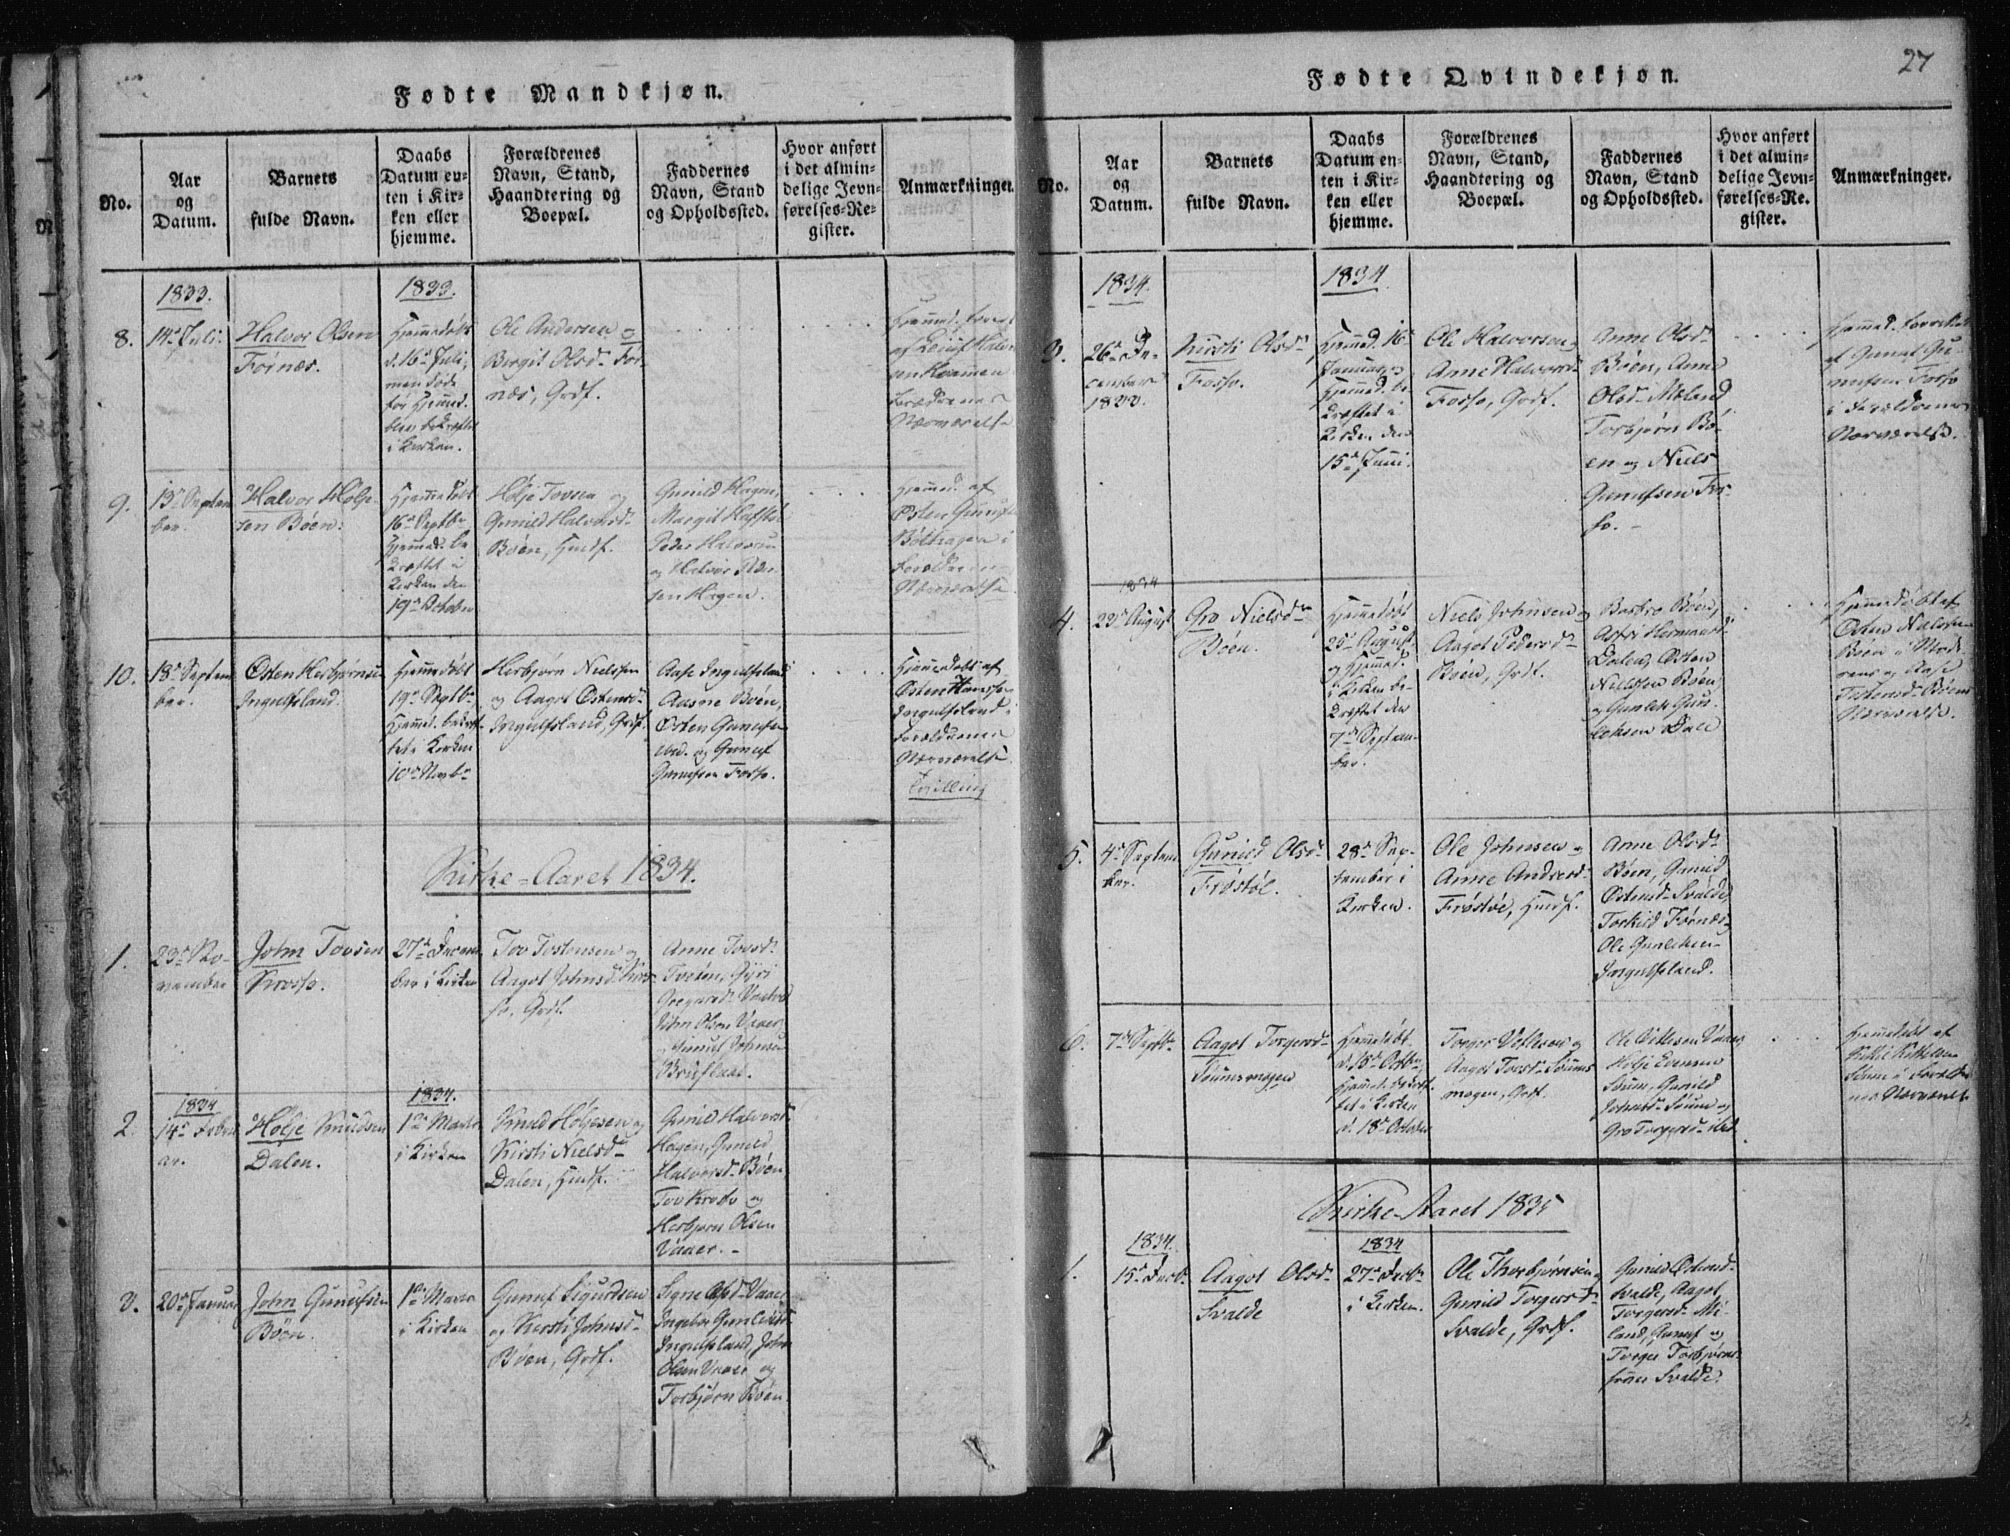 SAKO, Tinn kirkebøker, F/Fc/L0001: Ministerialbok nr. III 1, 1815-1843, s. 27